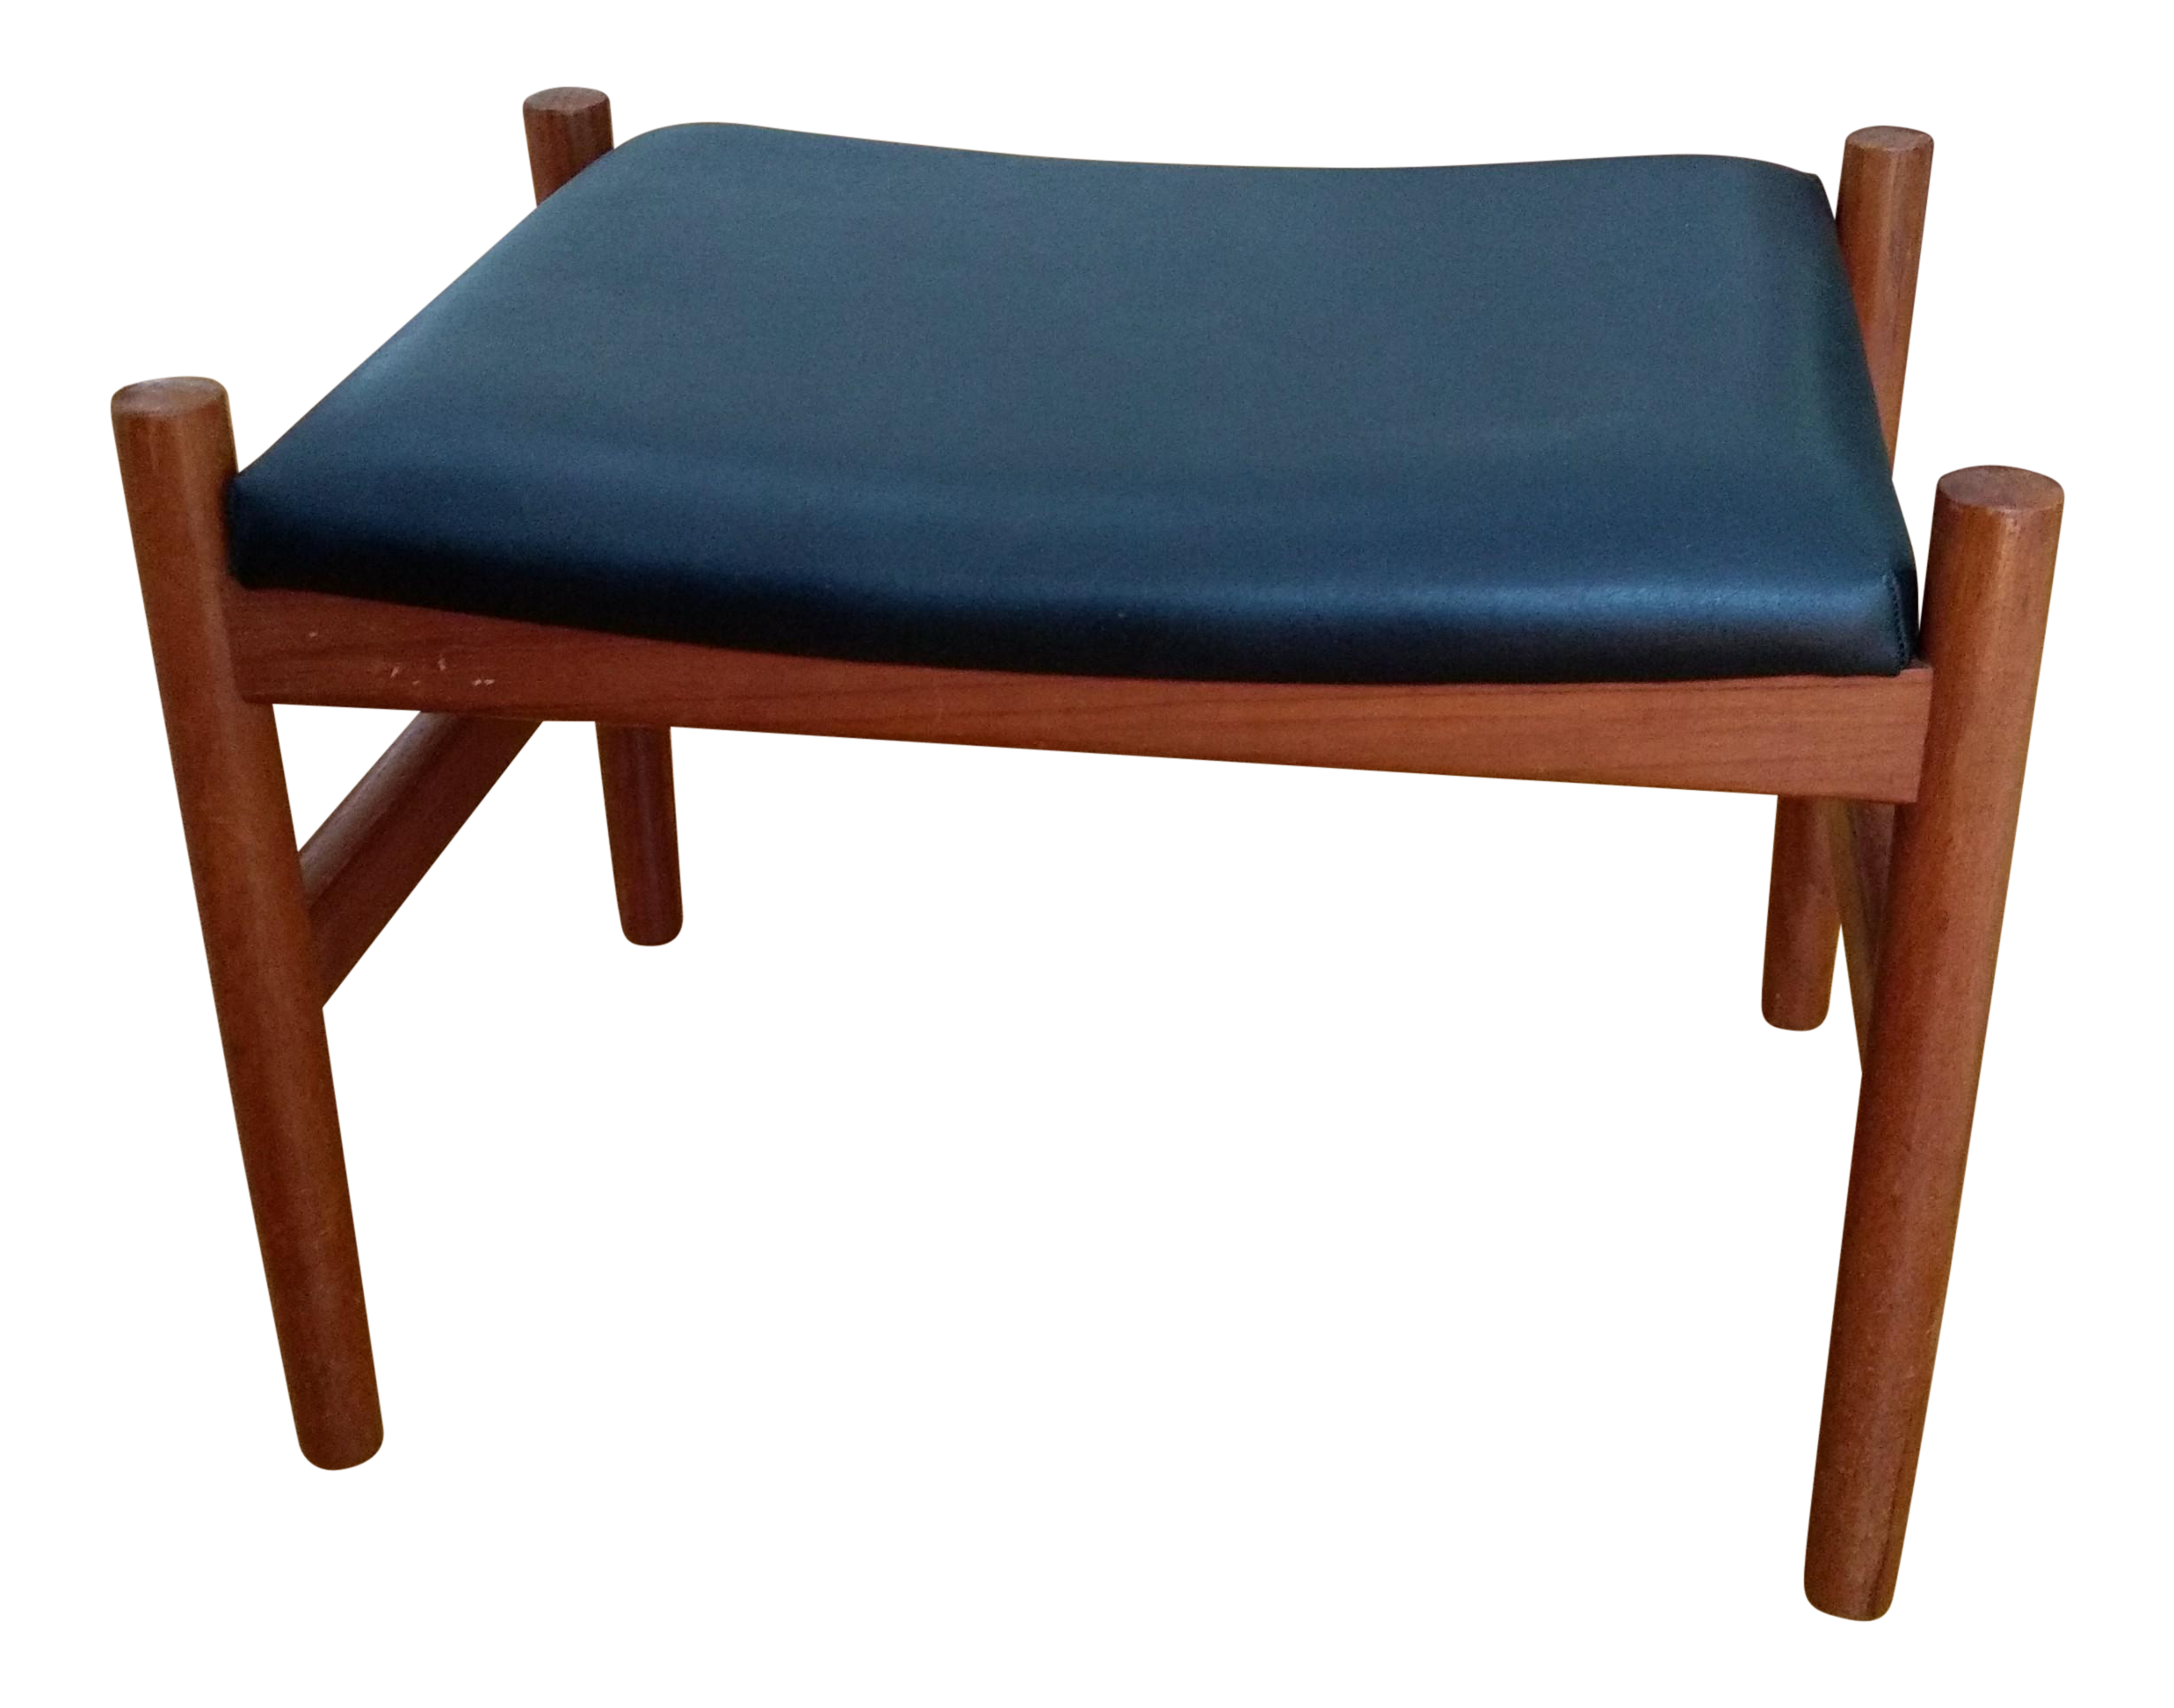 Vintage Danish Modern Teak Spottrup Stool Chairish